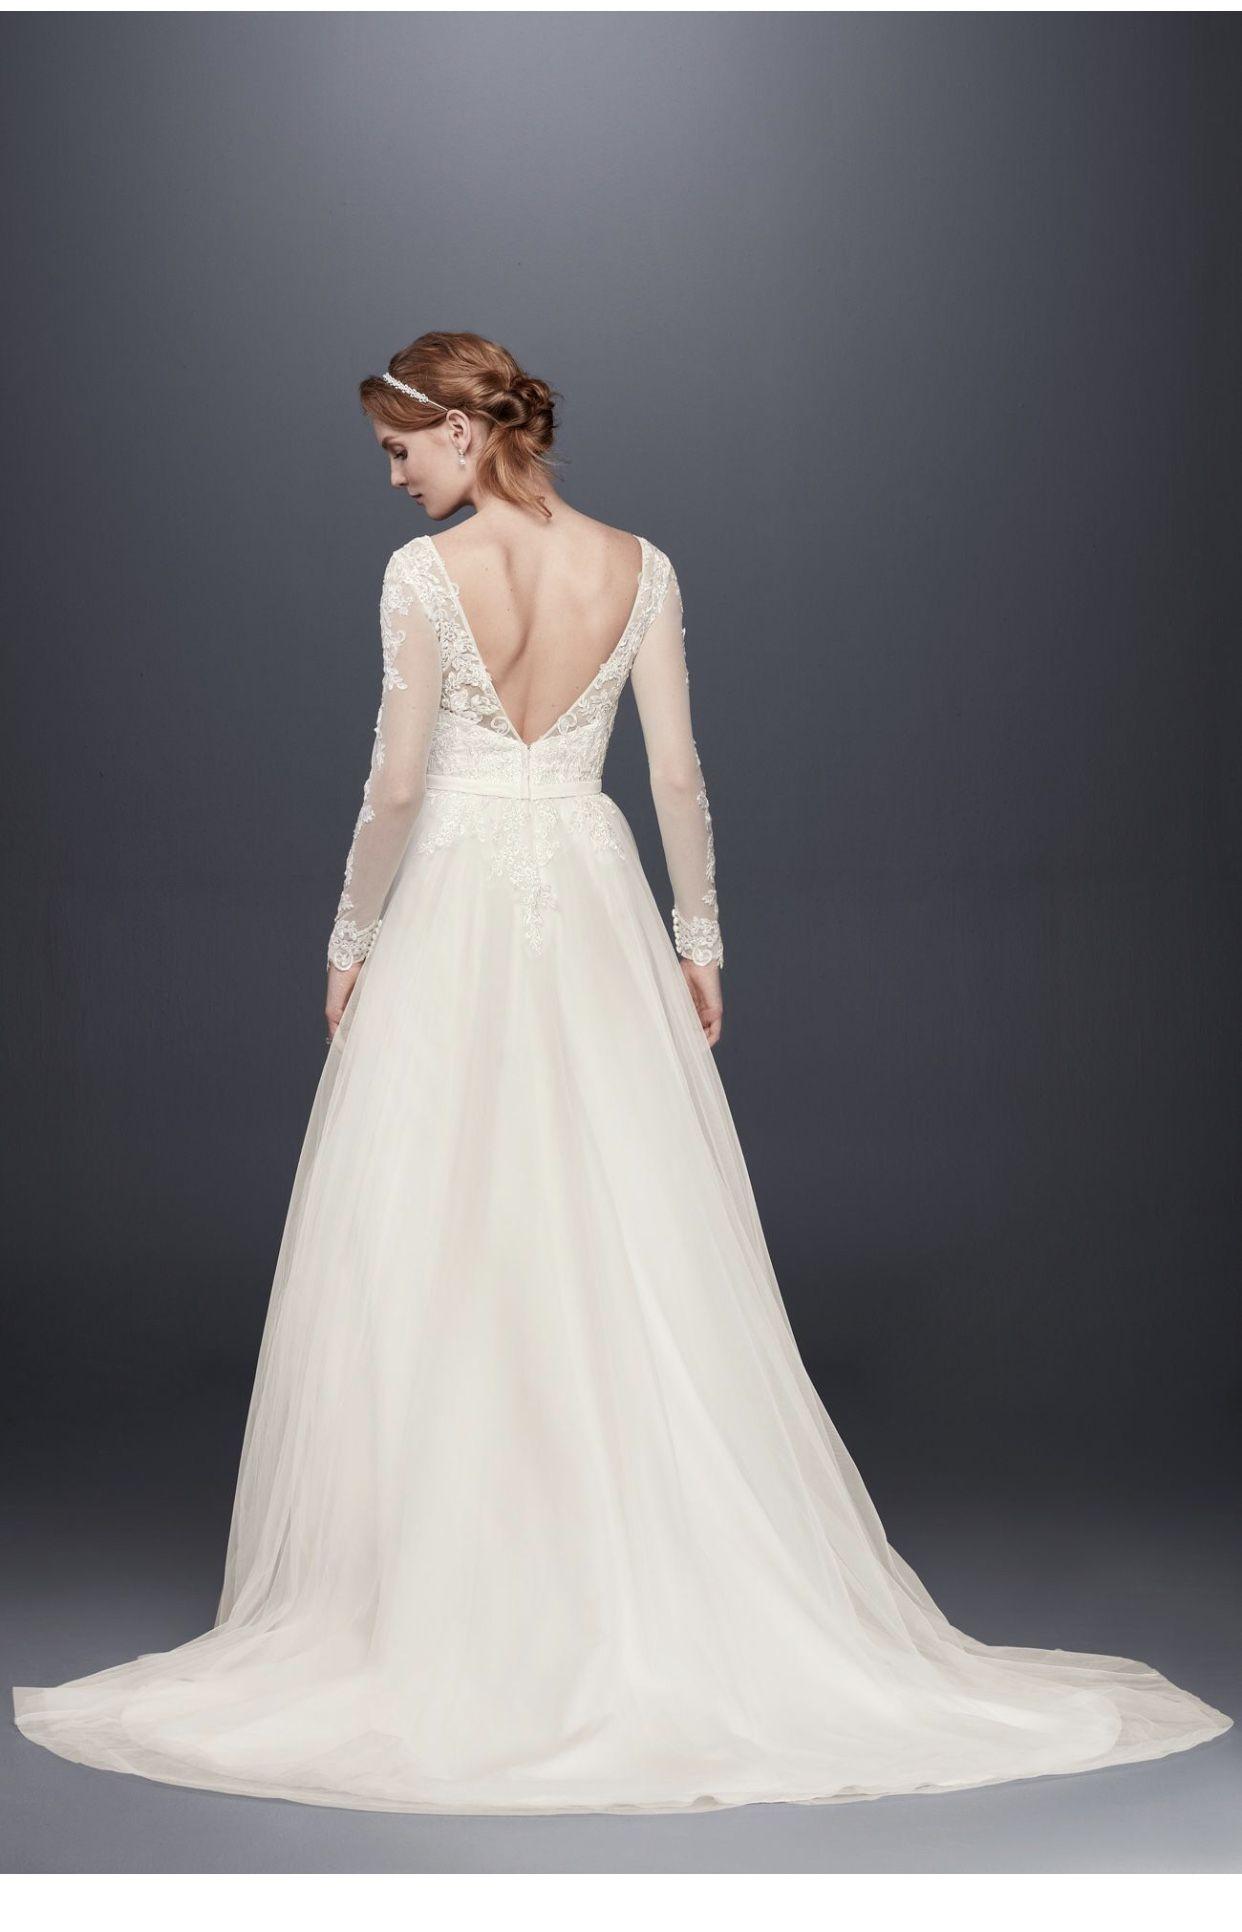 Pin by lively on wedding dresses pinterest wedding dress